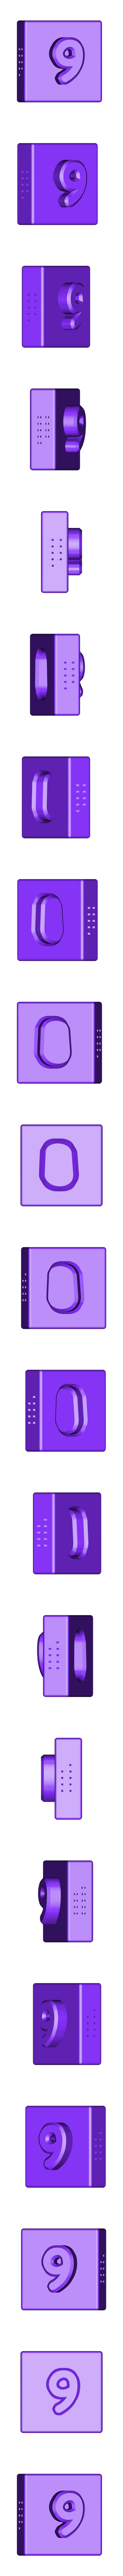 9.stl Download free STL file Mental blocks • Object to 3D print, RevK